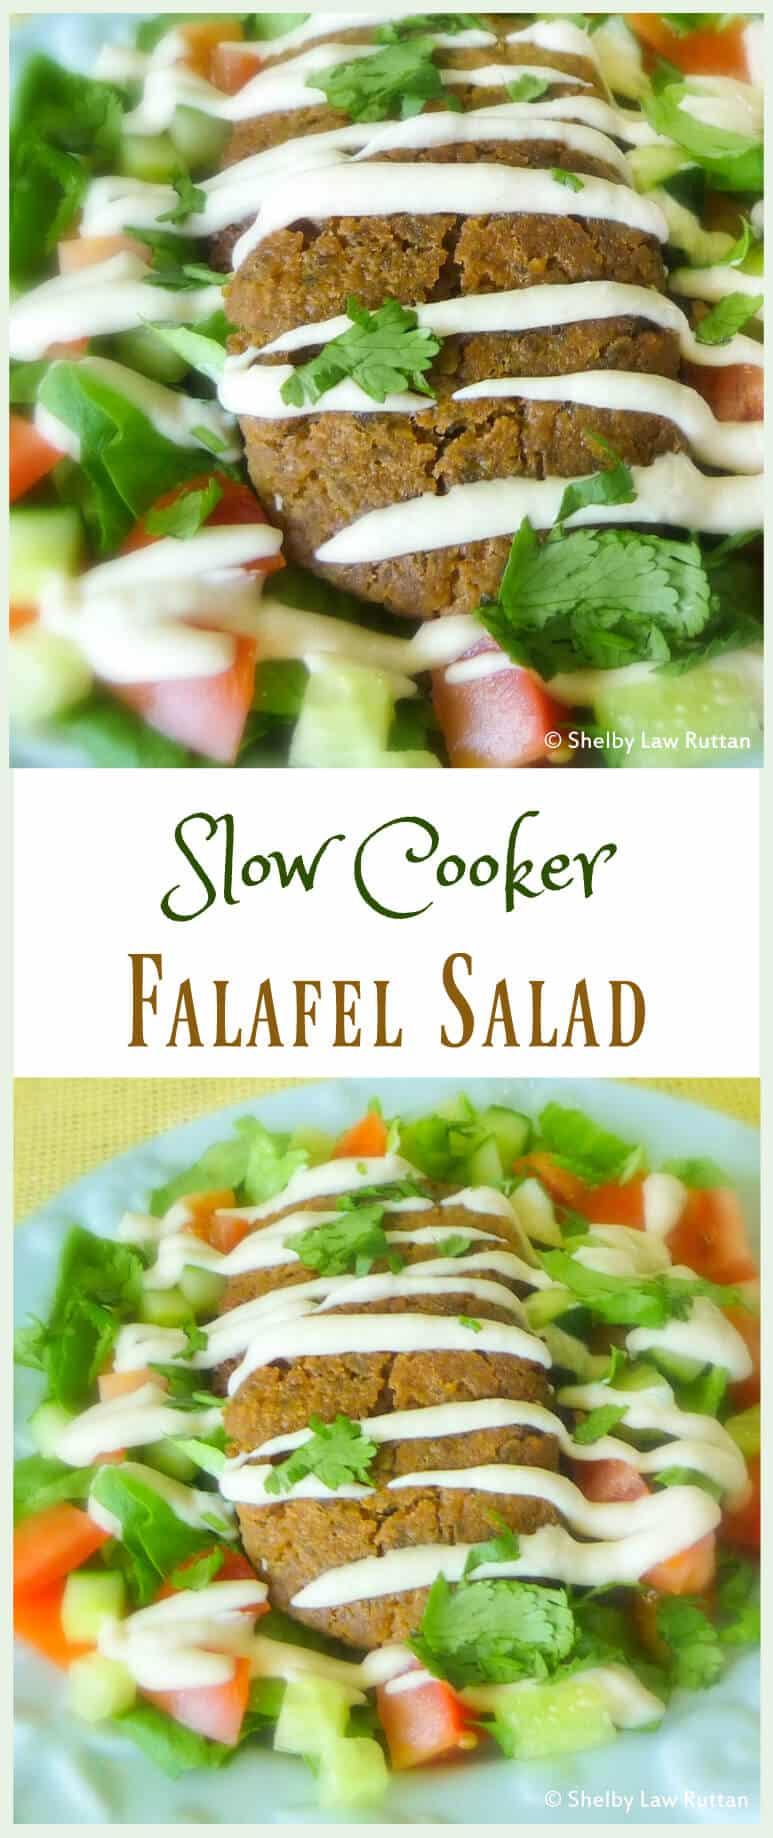 Falafel-Salad-Pinterest-1